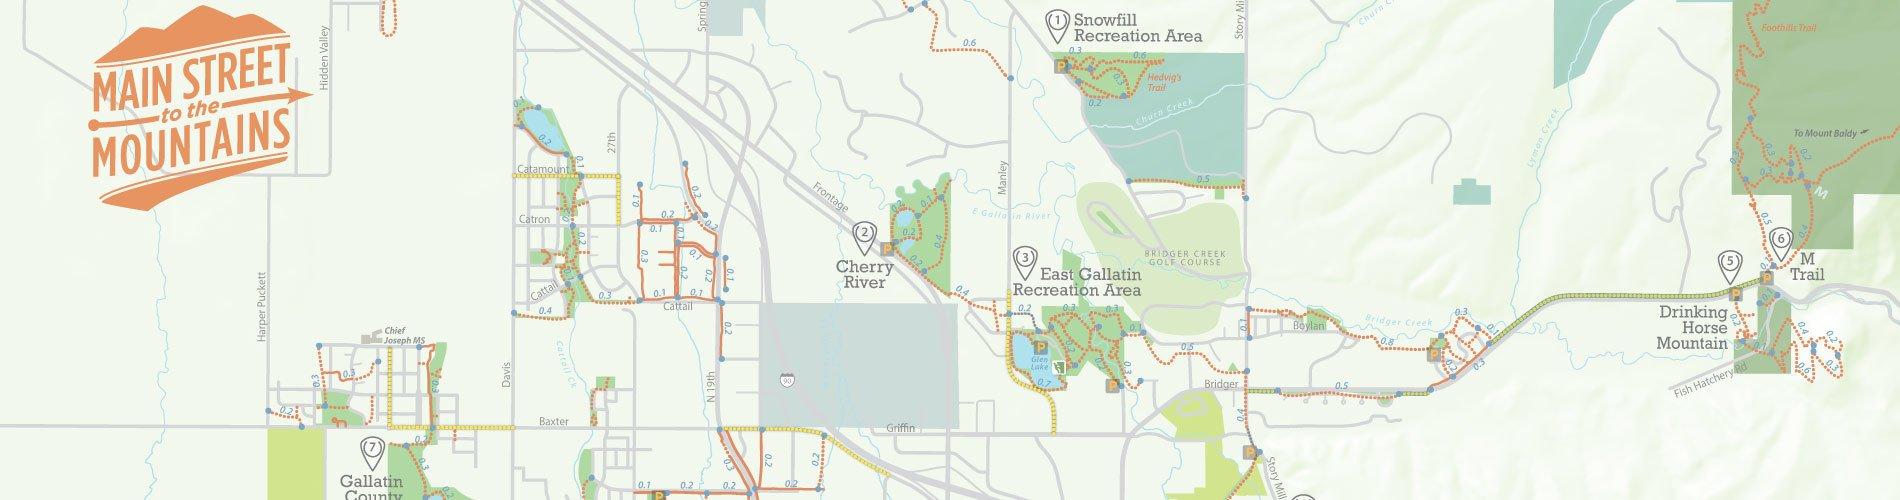 Trail Map | Gallatin Valley Land Trust